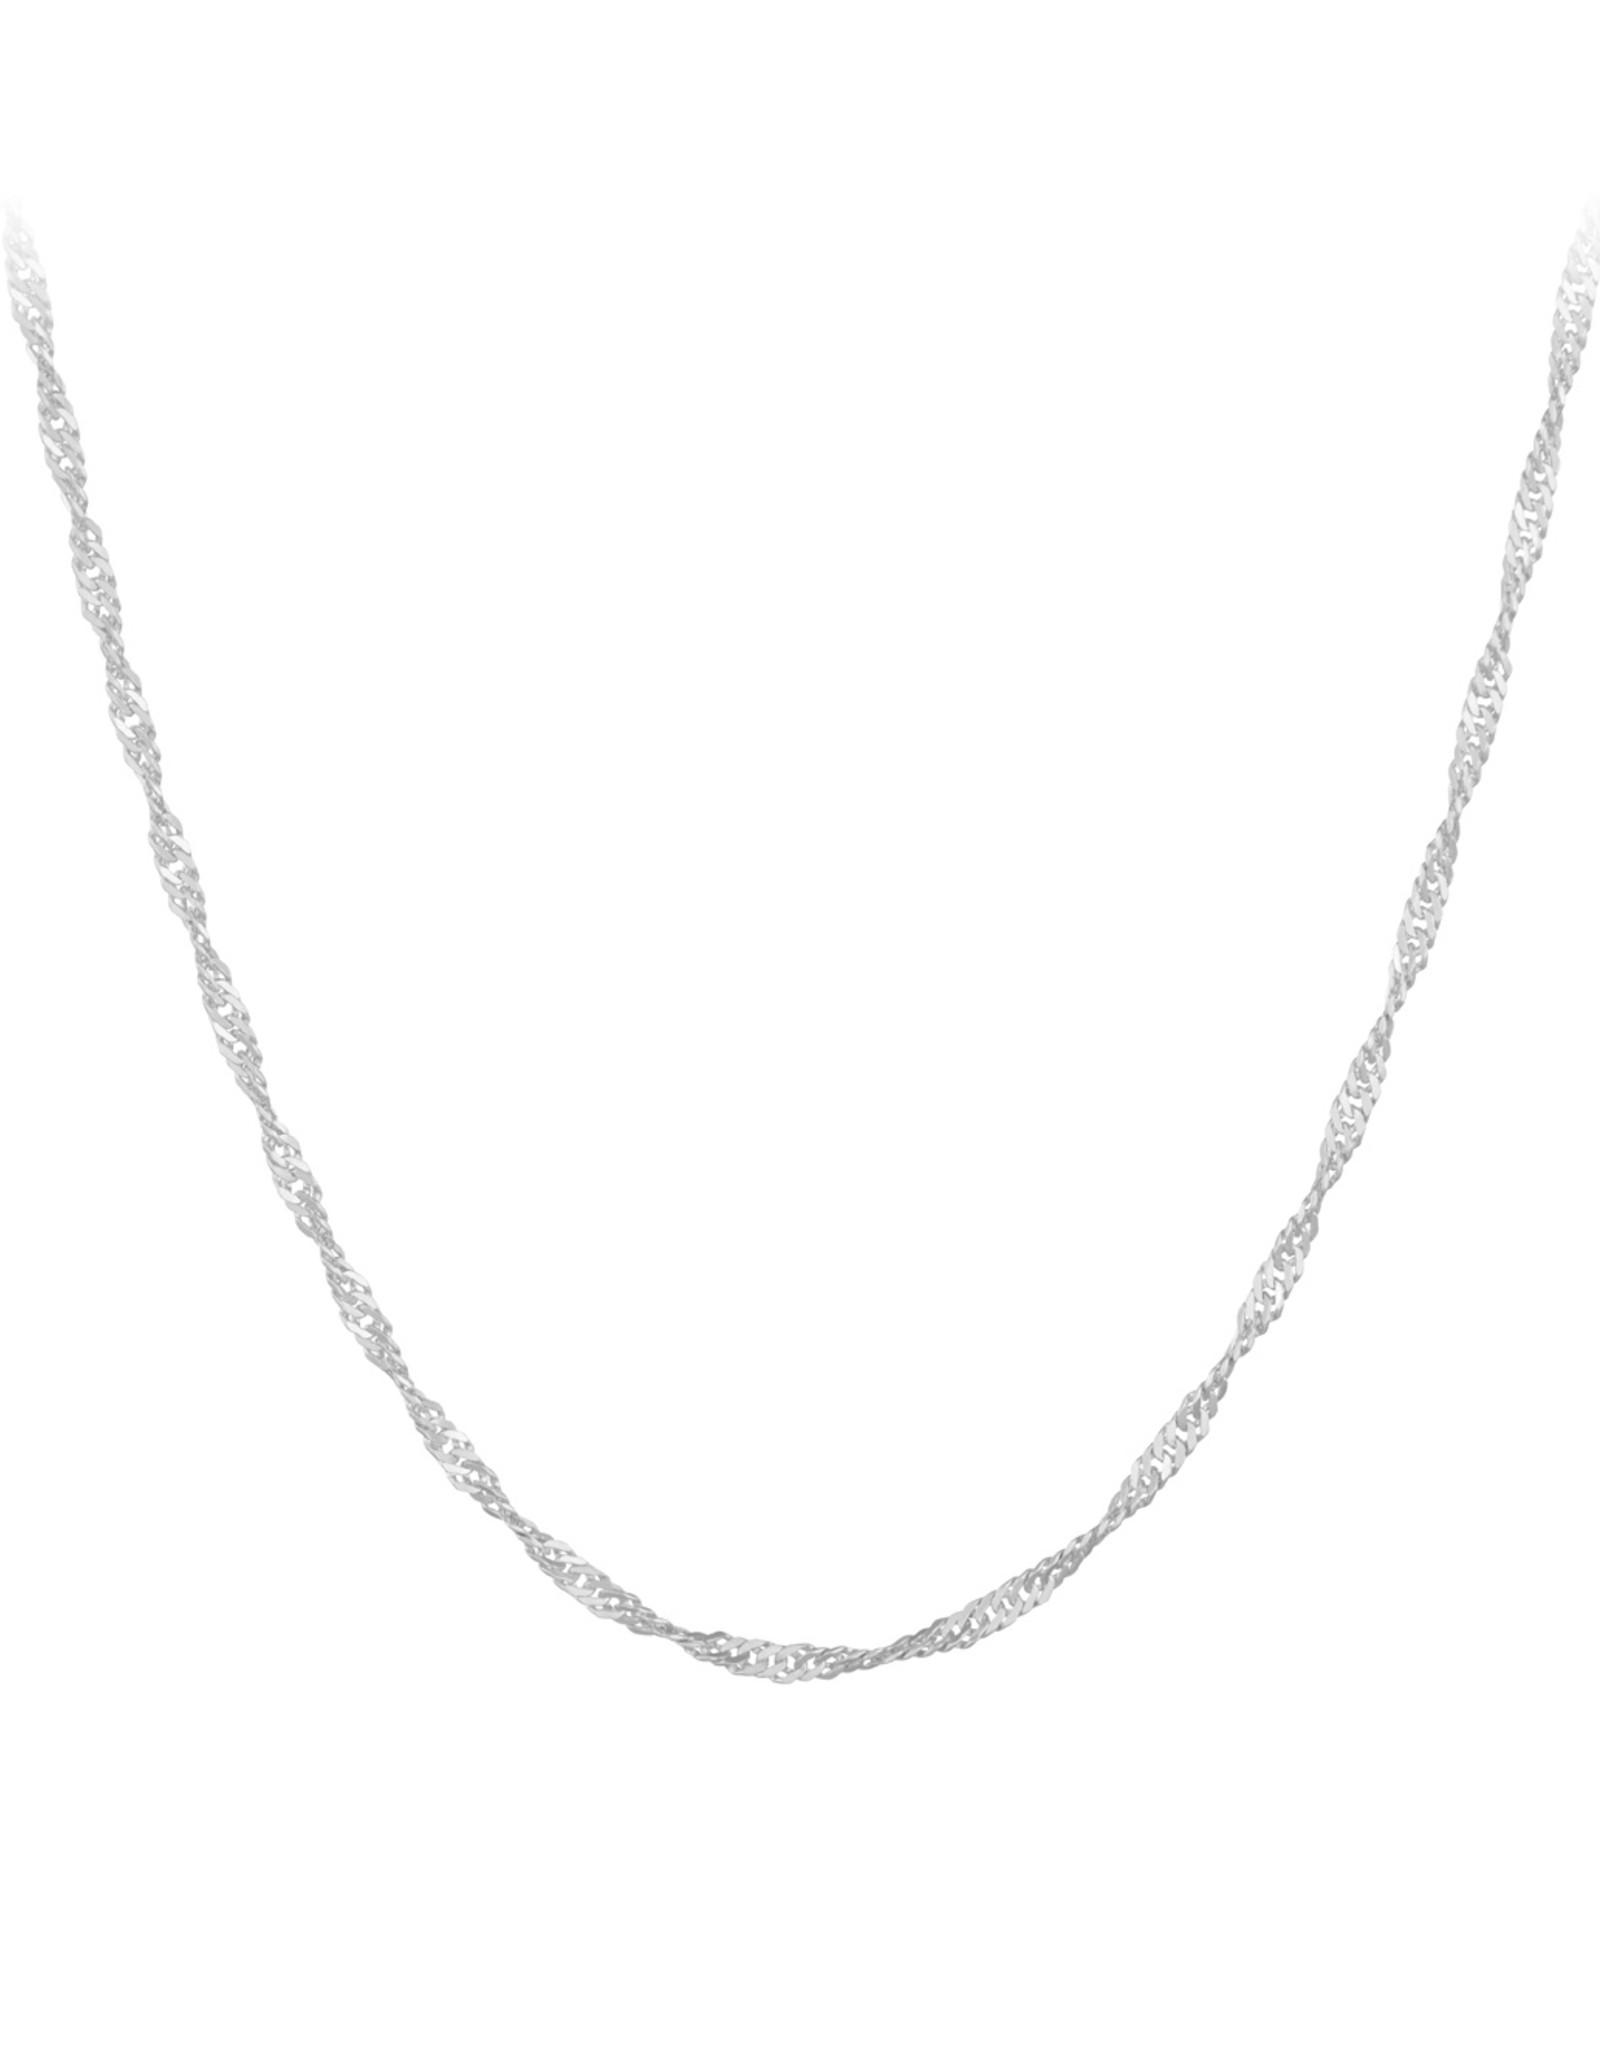 Pernille Corydon Singapore Necklace Long